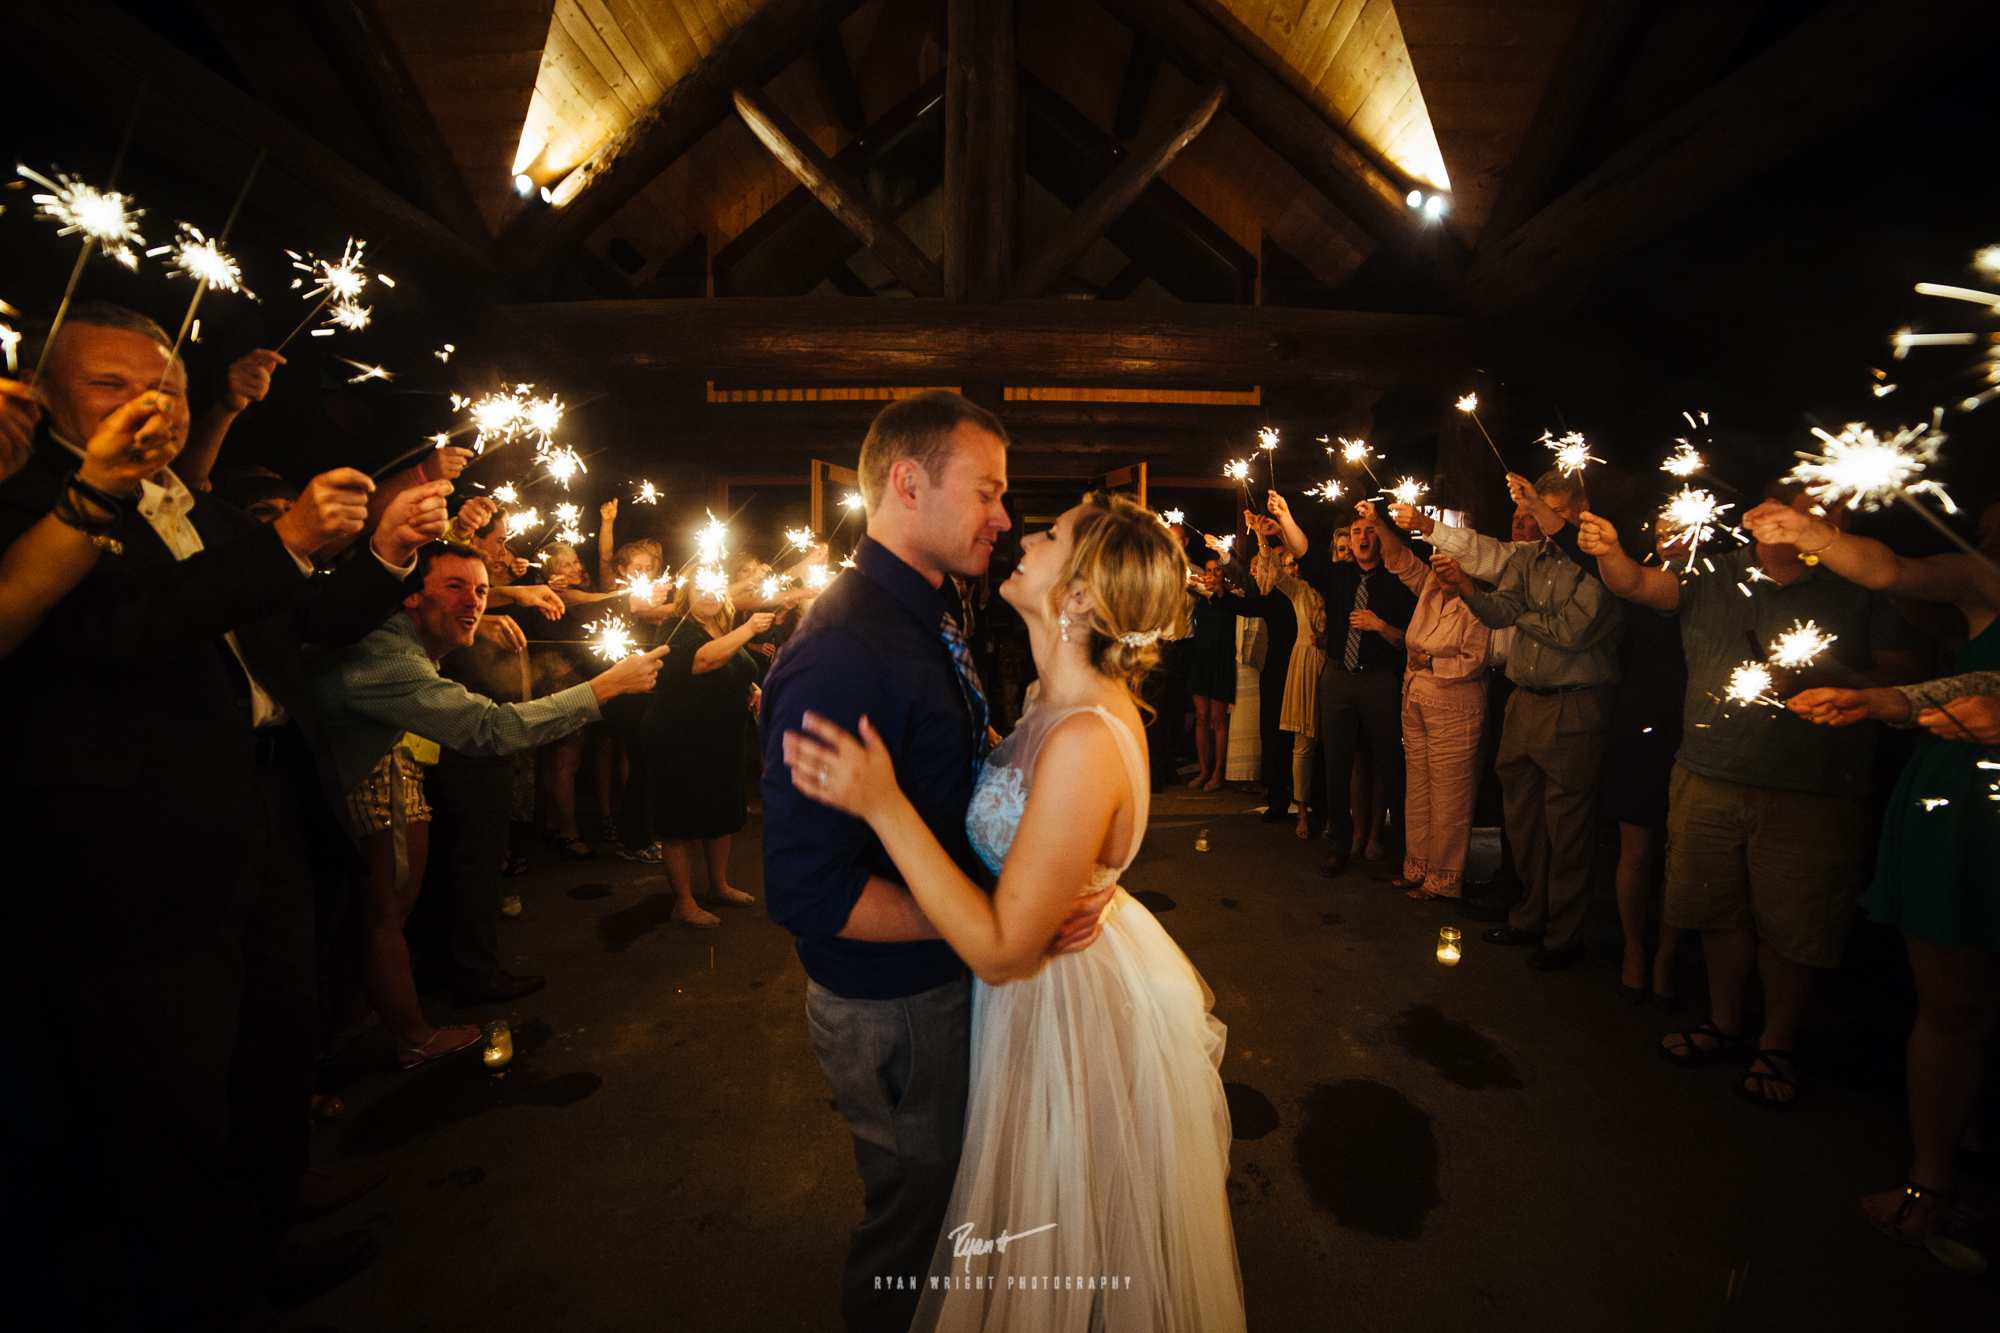 Breckenridge wedding outdoor photographer bridal party breck weddings